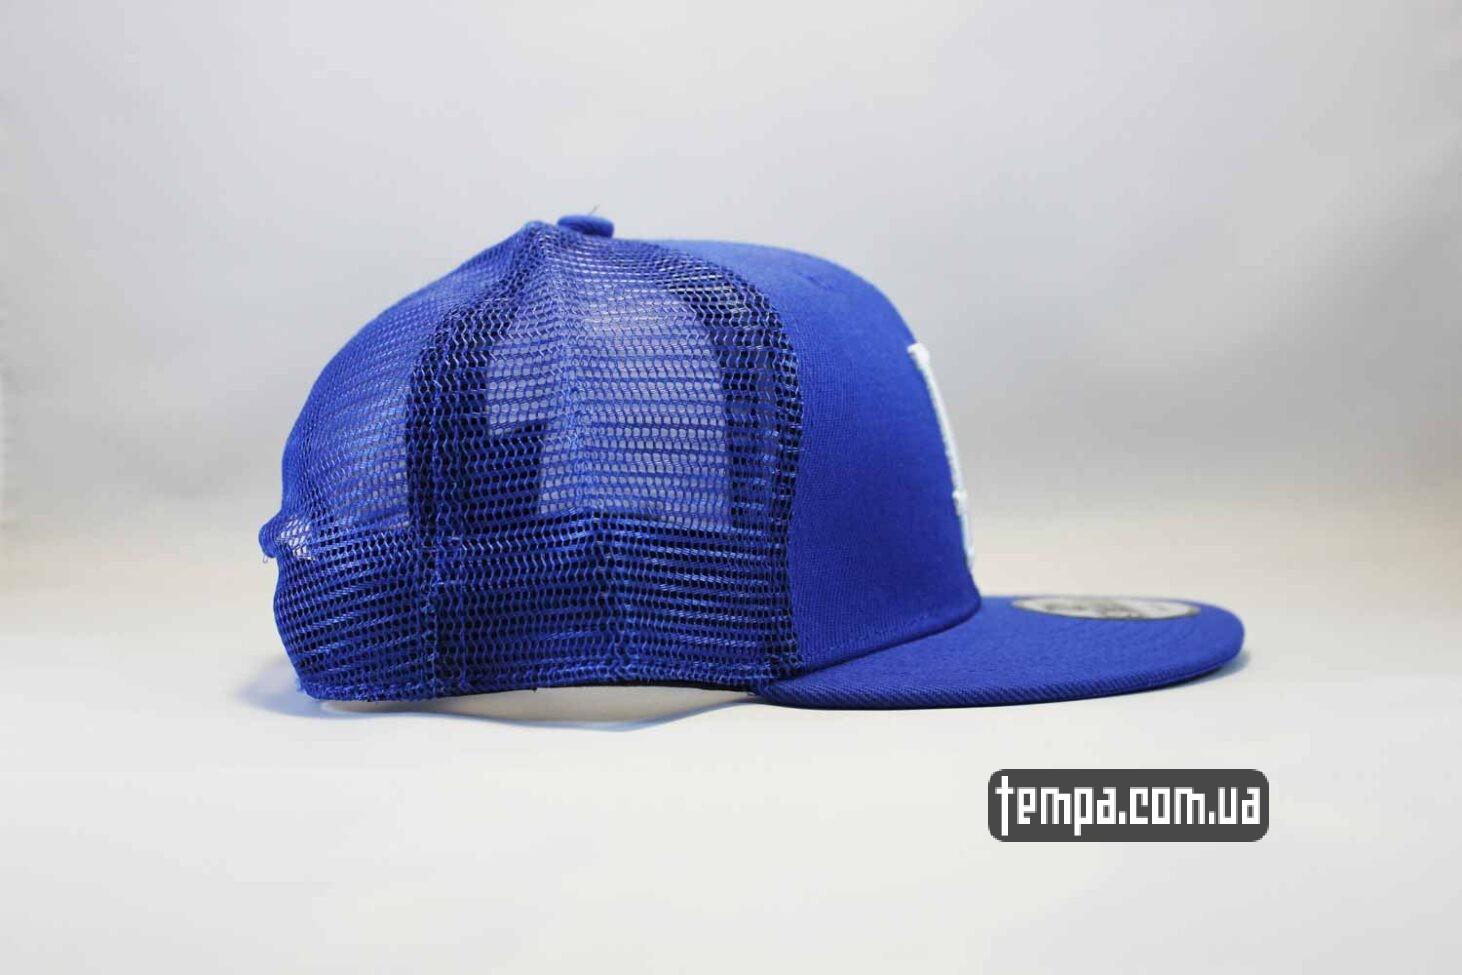 тракер бейсболки украина кепка Trucker Snapback La Los Angeles New Era синяя